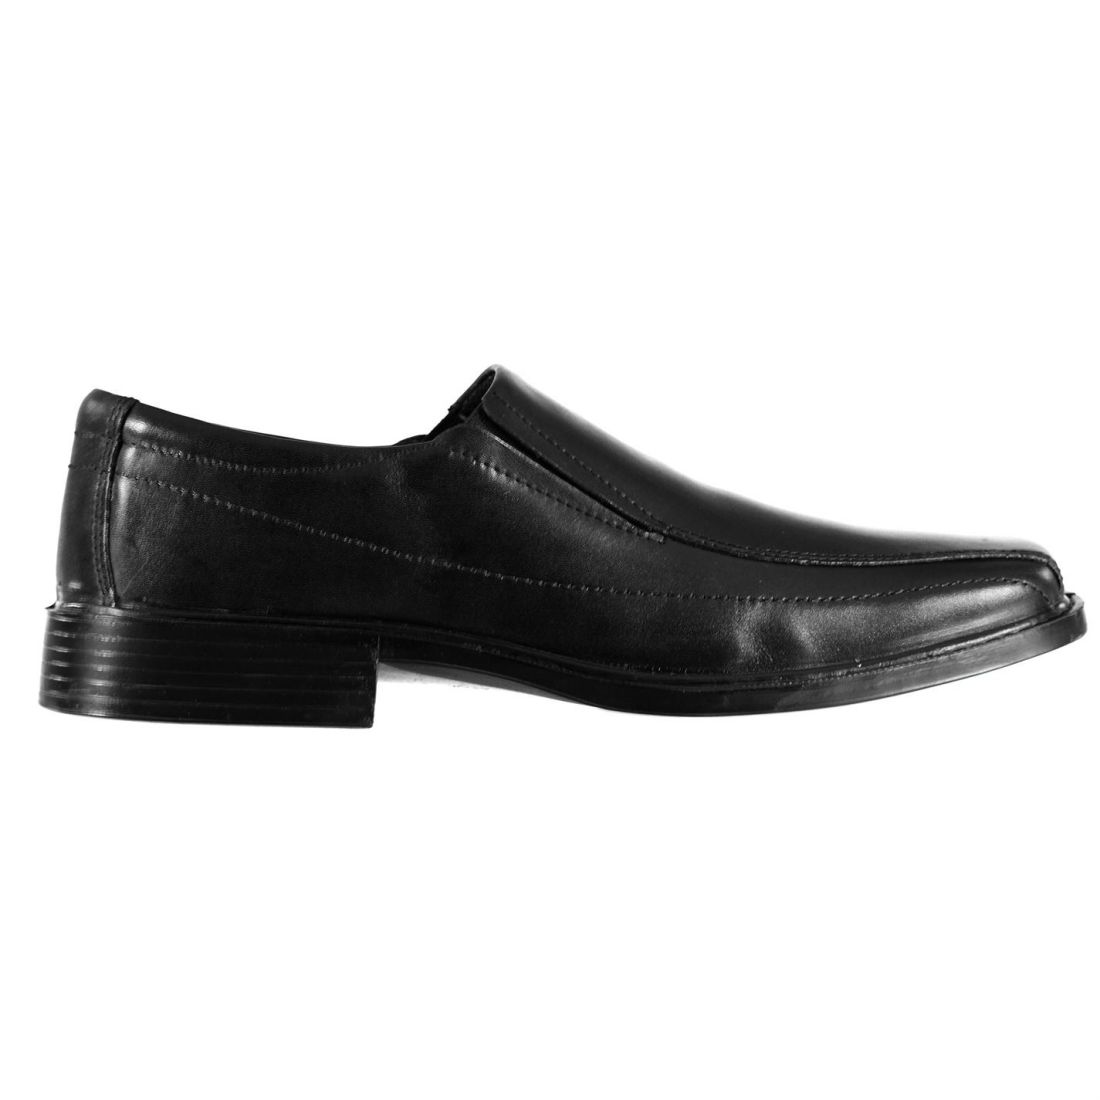 Jonathon Shoes Gents Superlight nero Formale Charles leggero Uomo On Slip wFfwOr